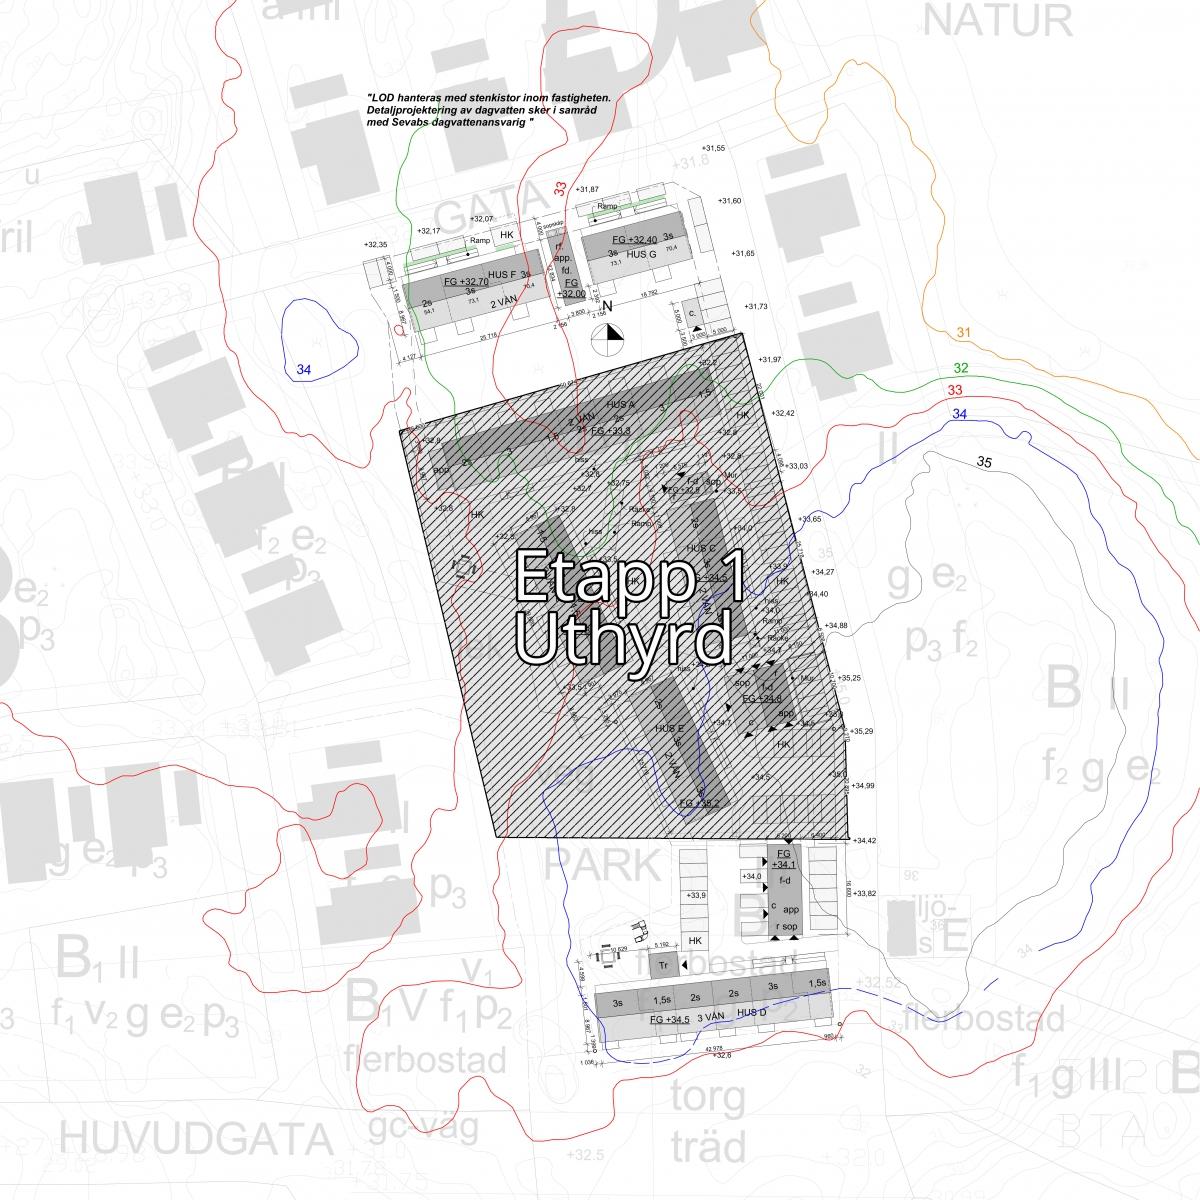 17-518 Tosterön Sitplan (1) (1)